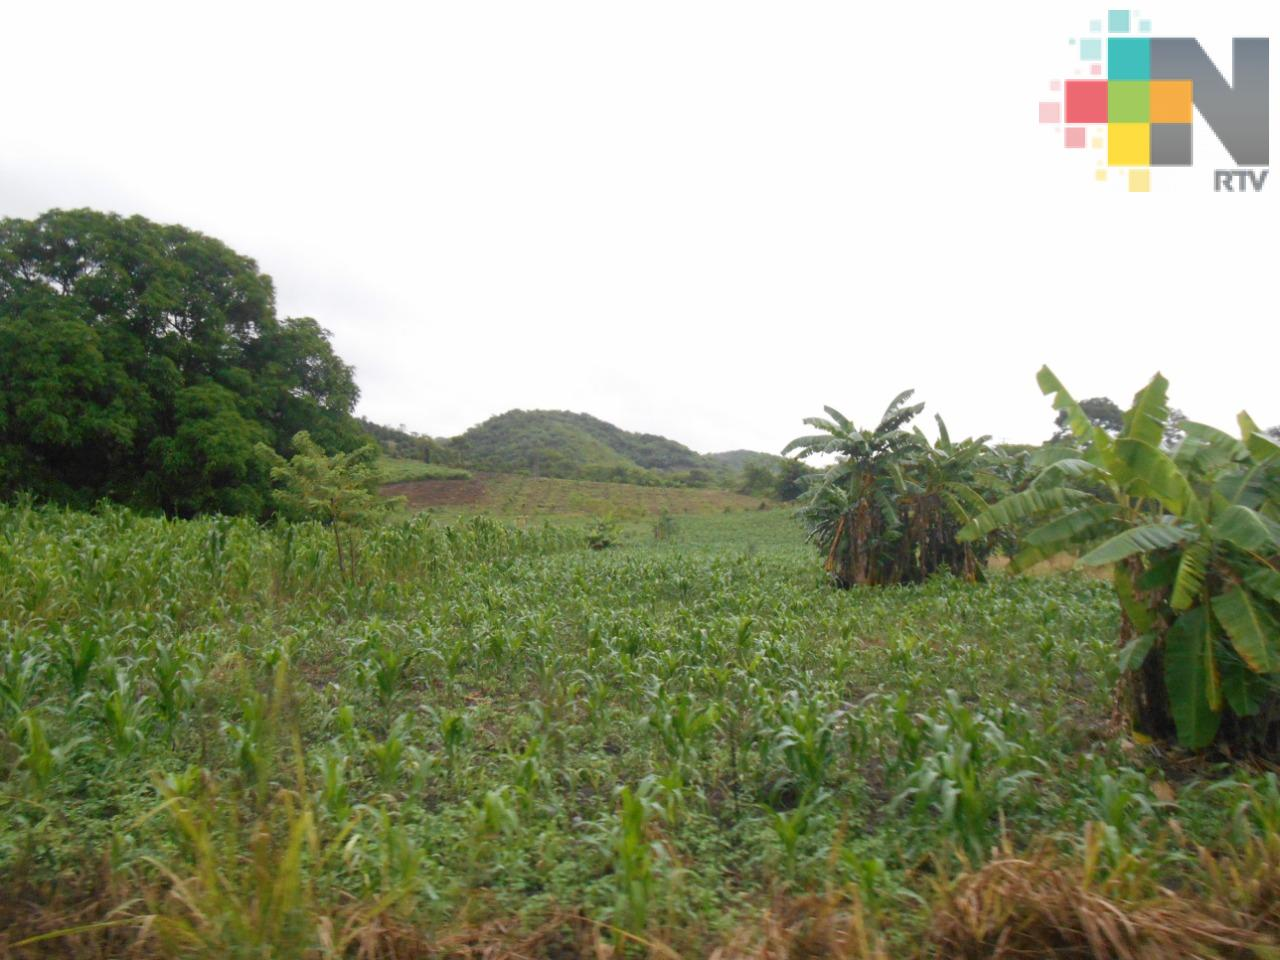 Gobernador de Veracruz abroga el decreto que estableció la estrategia Sembrando Bienestar Común